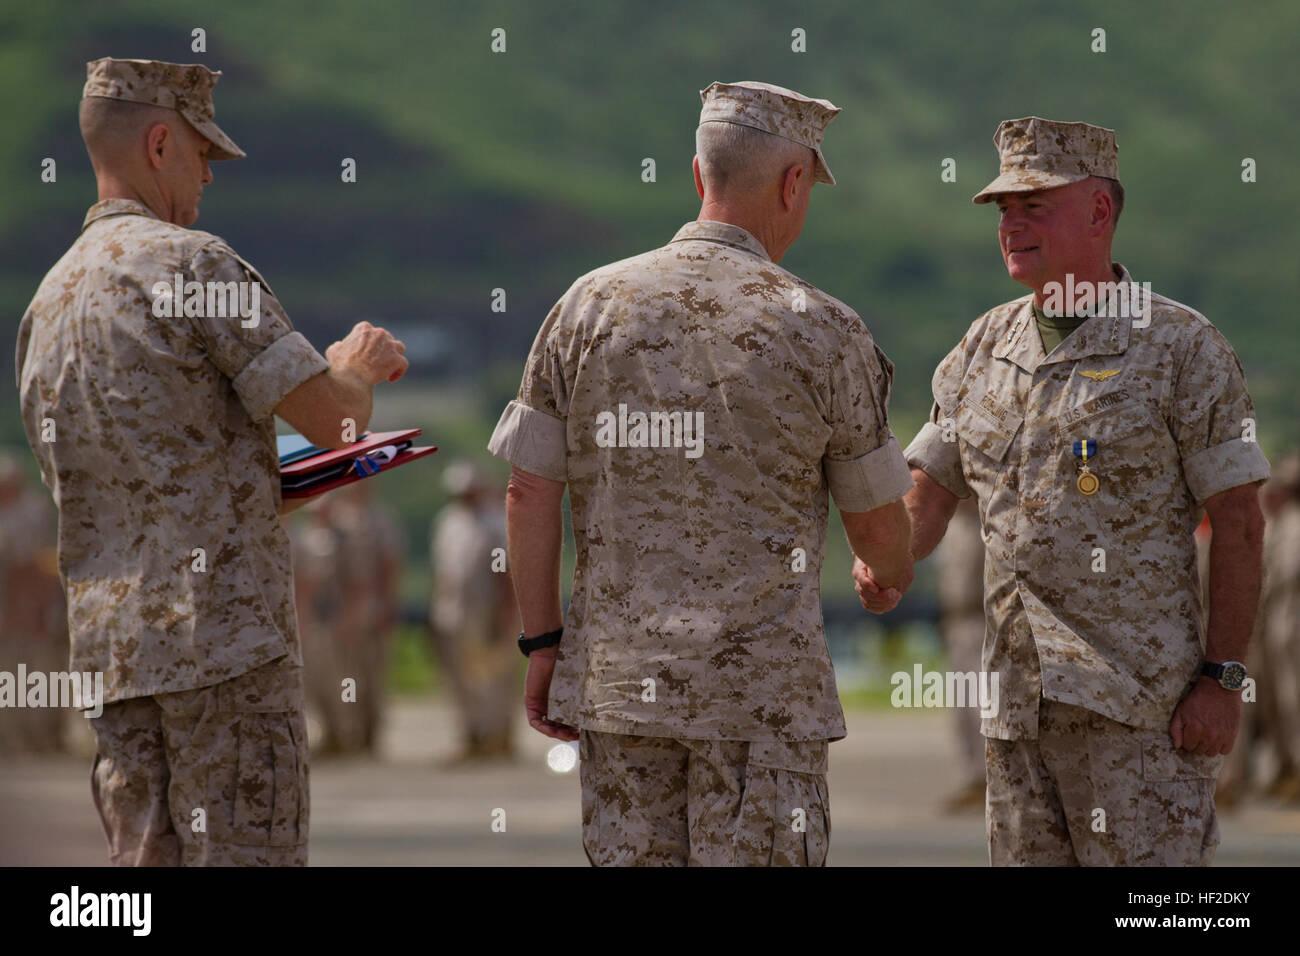 U.S. Marine Corps Gen. James F. Amos, commandant of the Marine Corps, presents awards to U.S. Marine Corps Lt. Gen. Stock Photo